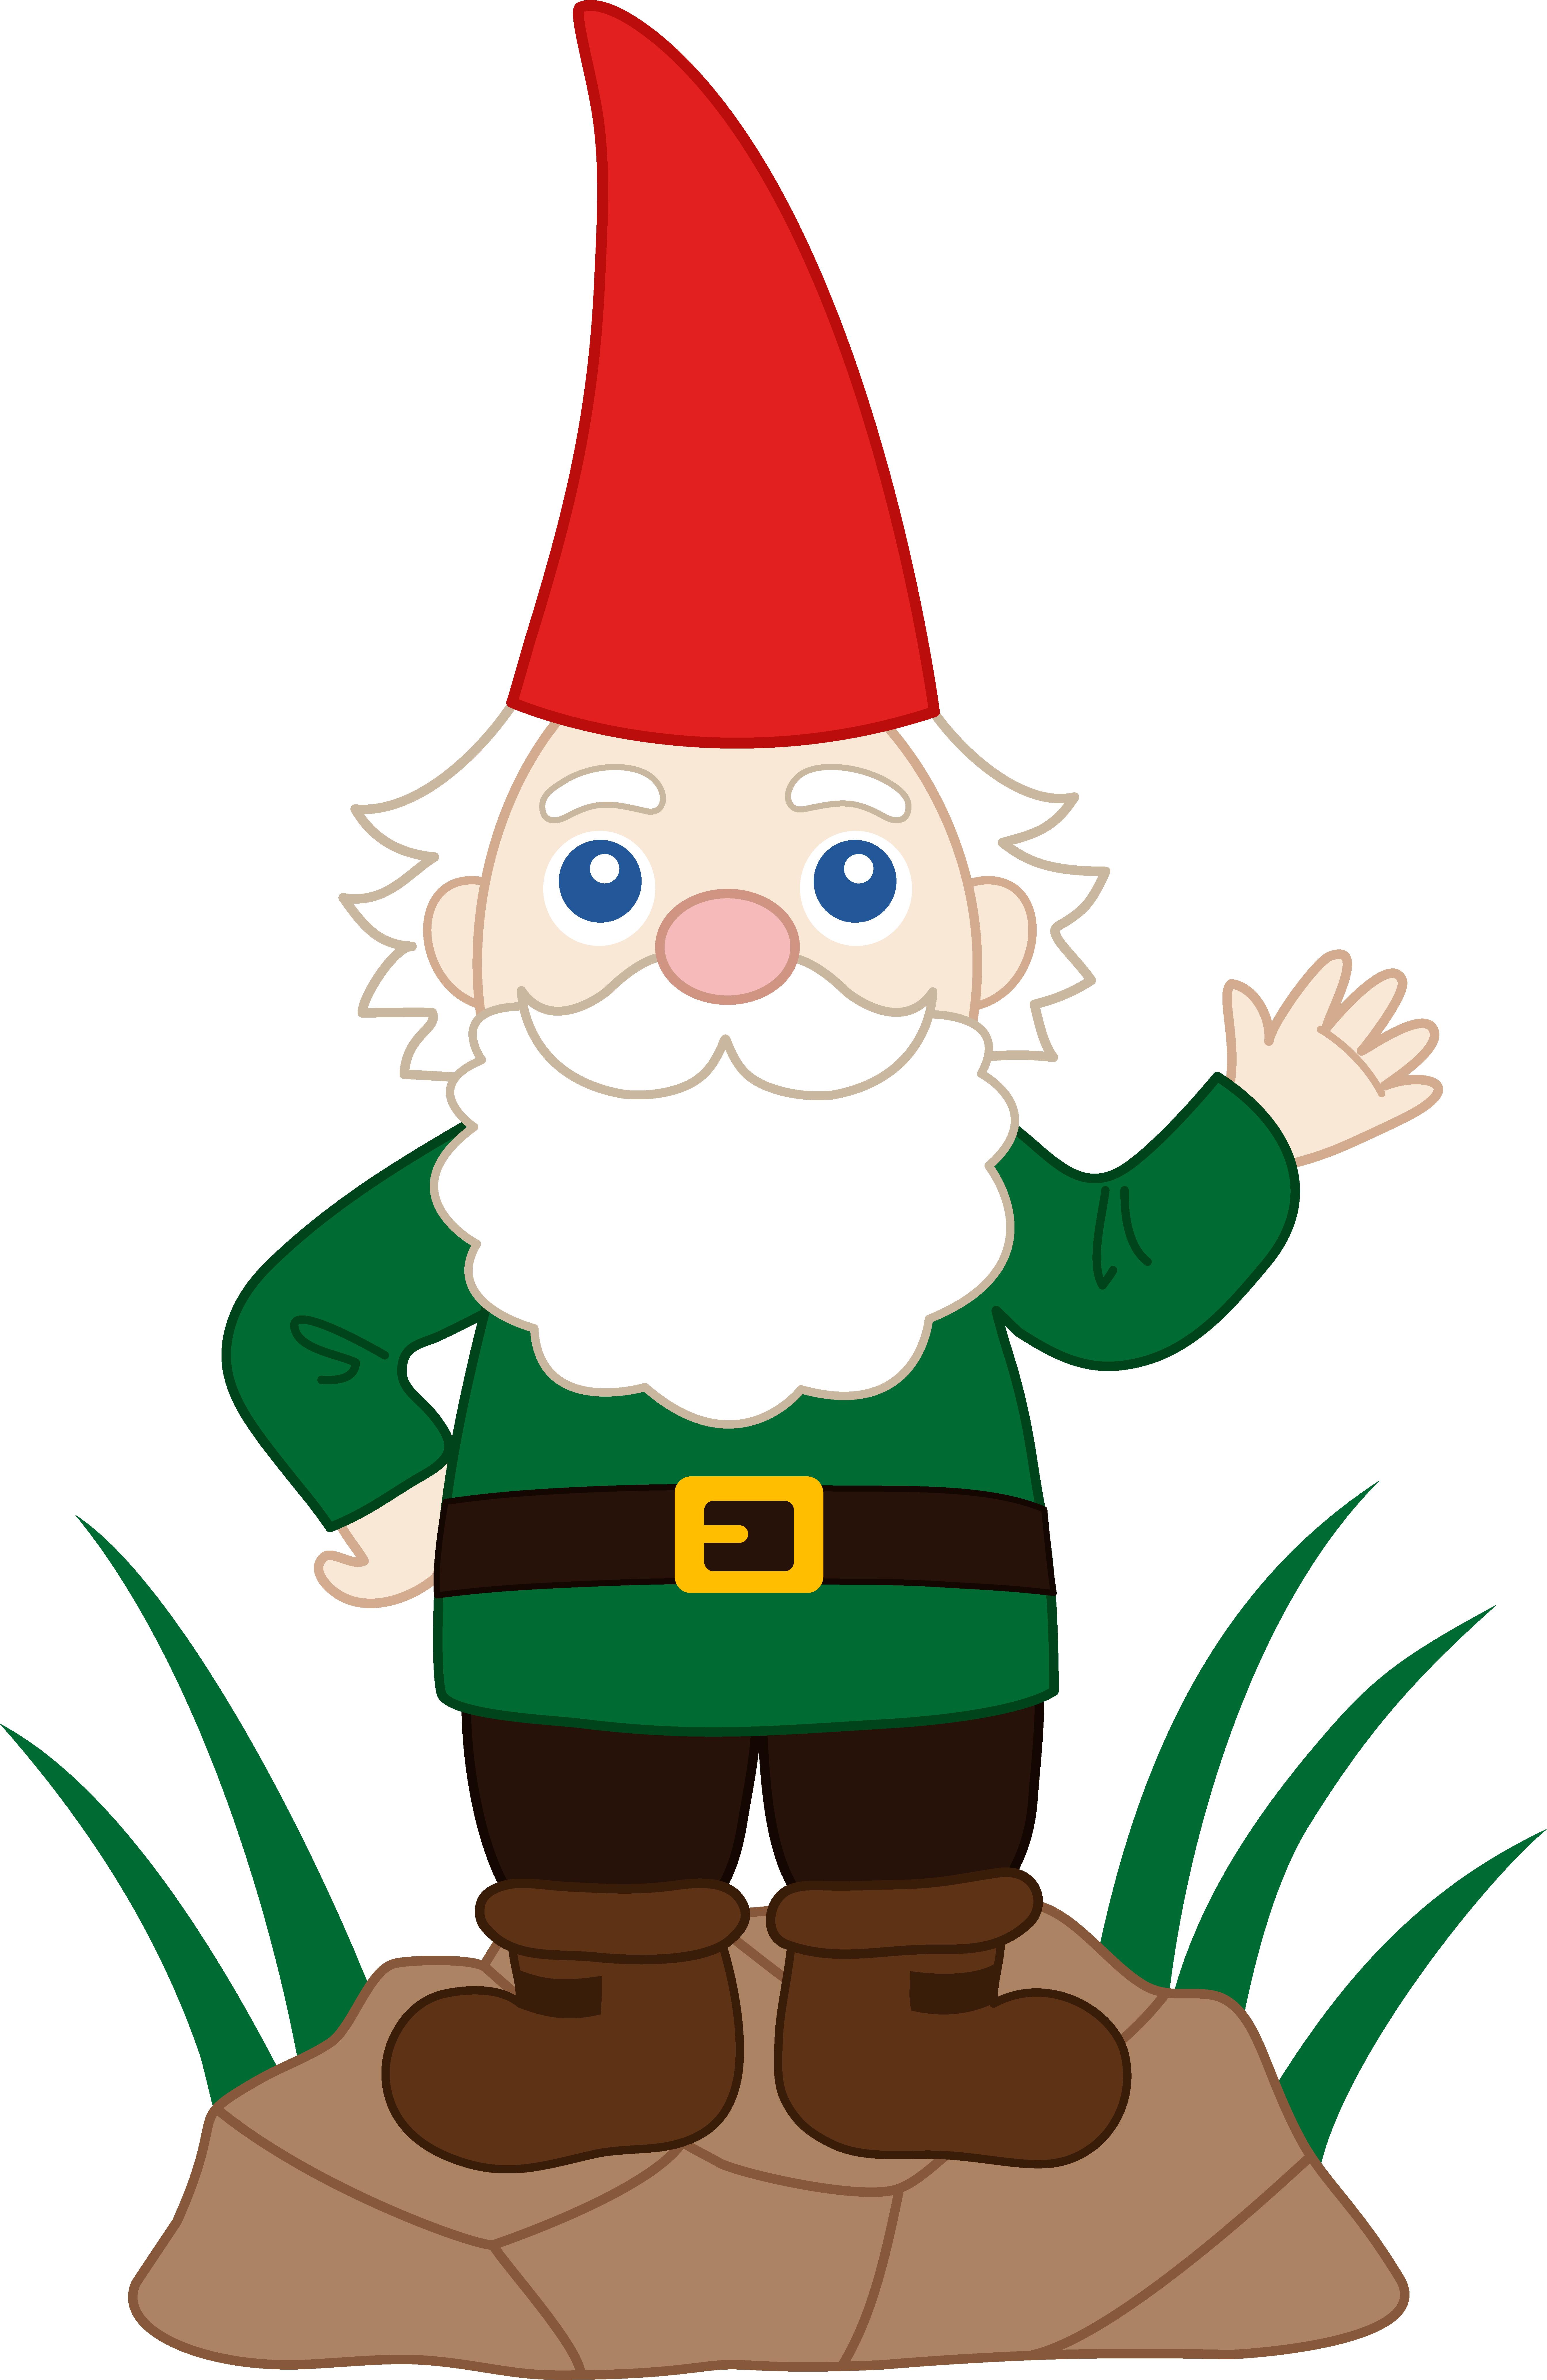 Friendly Garden Gnome - Free Clip Art-Friendly Garden Gnome - Free Clip Art-8